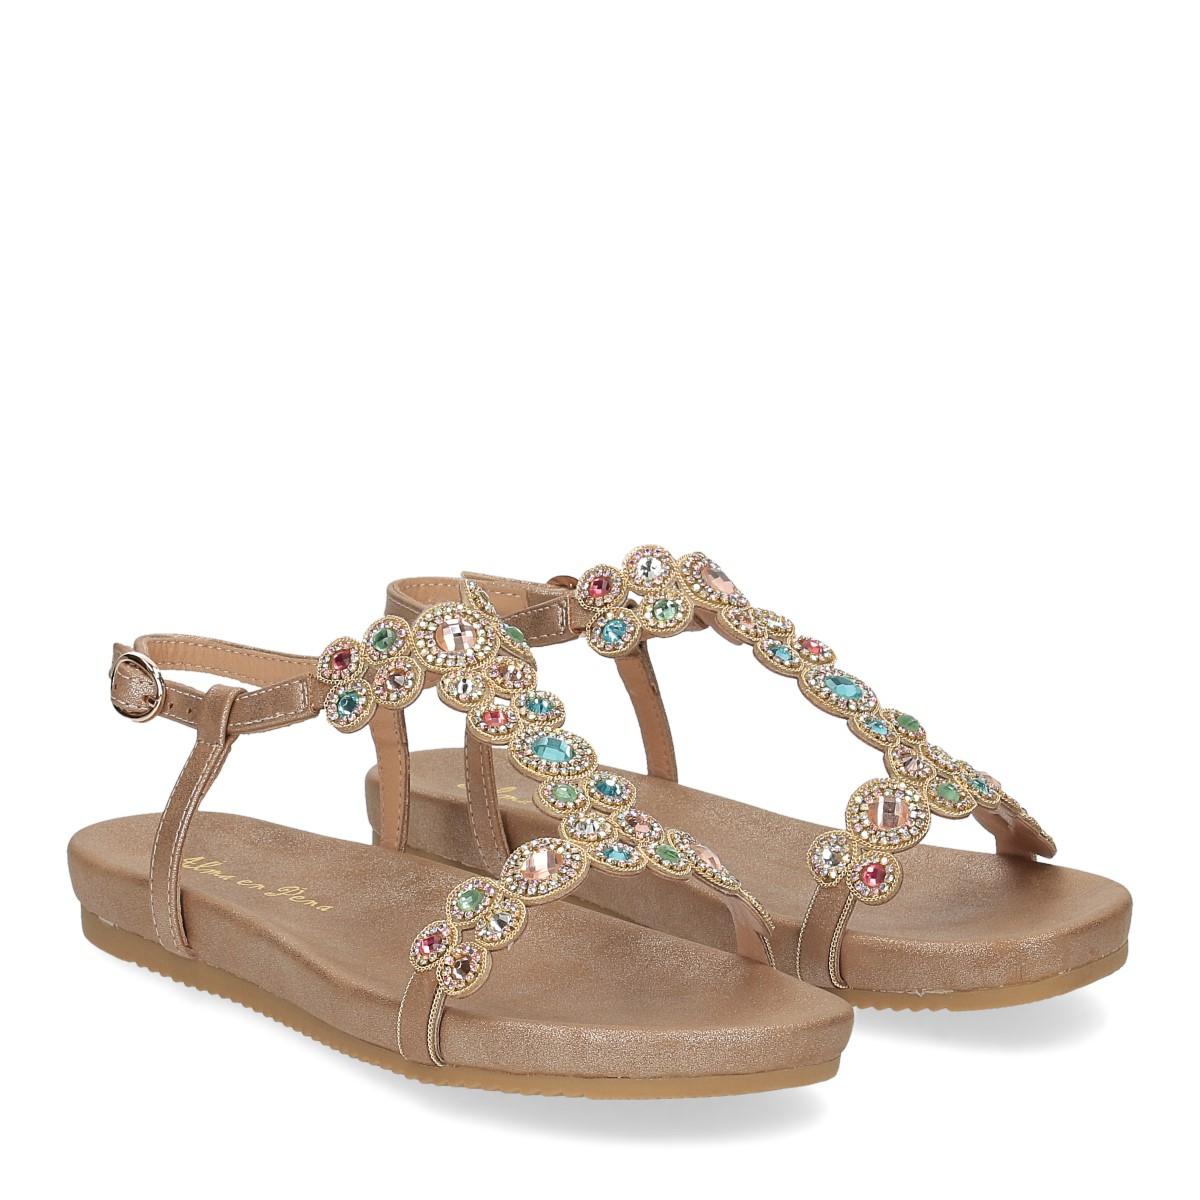 Alma en Pena sandalo oporto bronze v20833